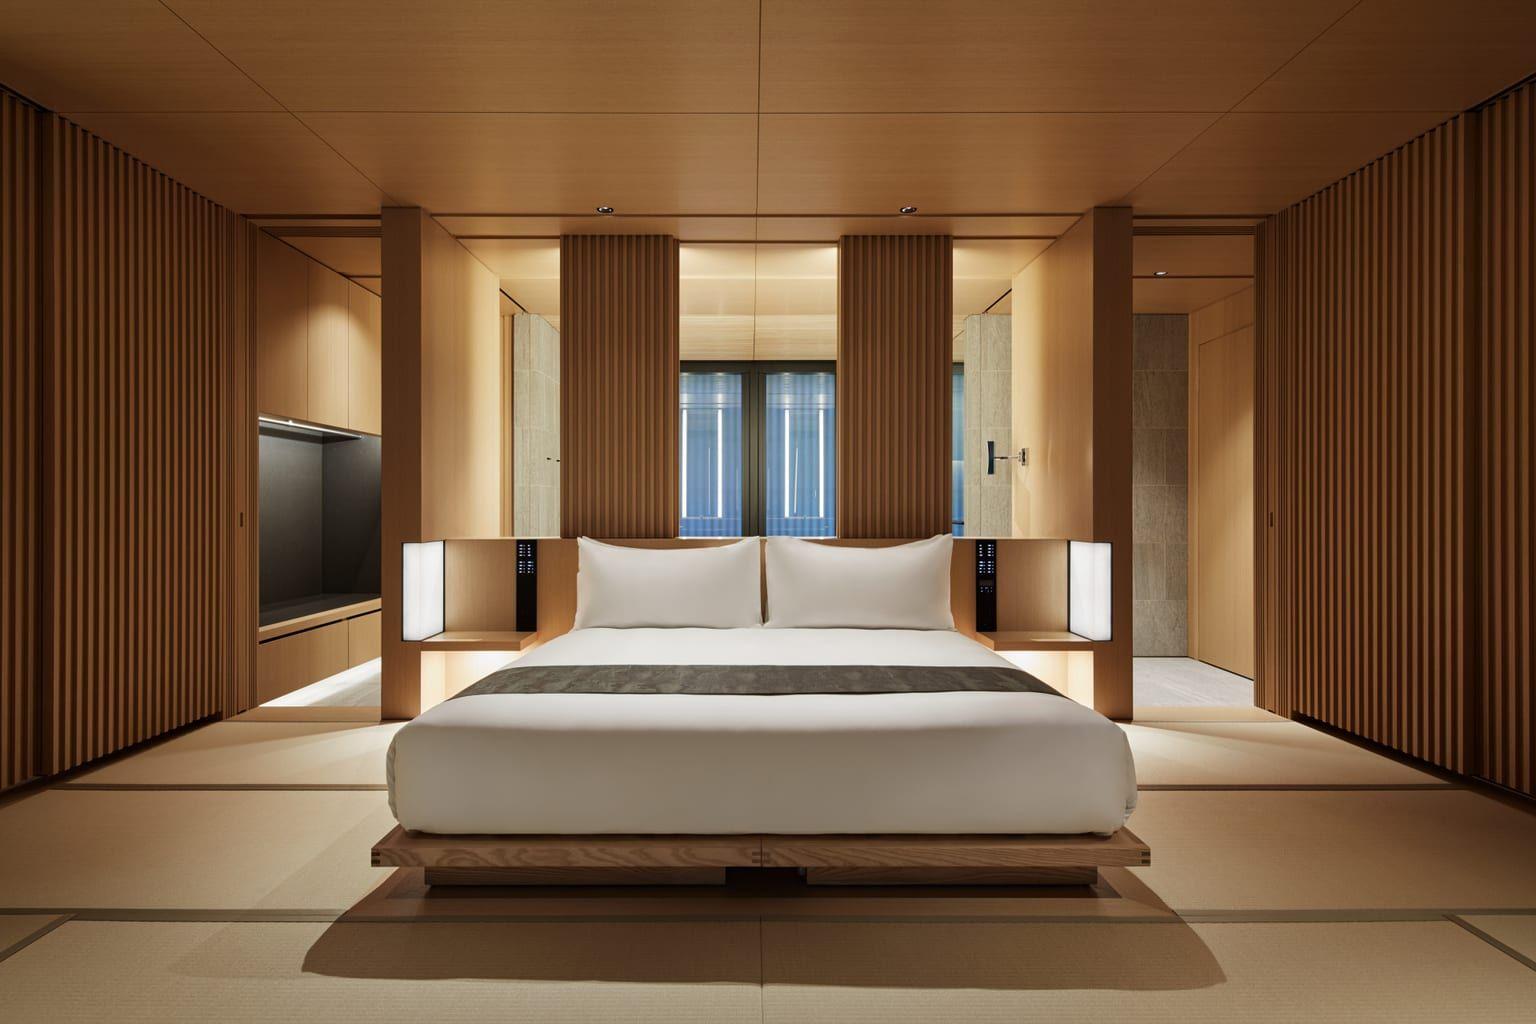 Aman Kyoto Japan Pavilion Interior Luxury Hotel Room Hotel Room Design Luxury Accommodation